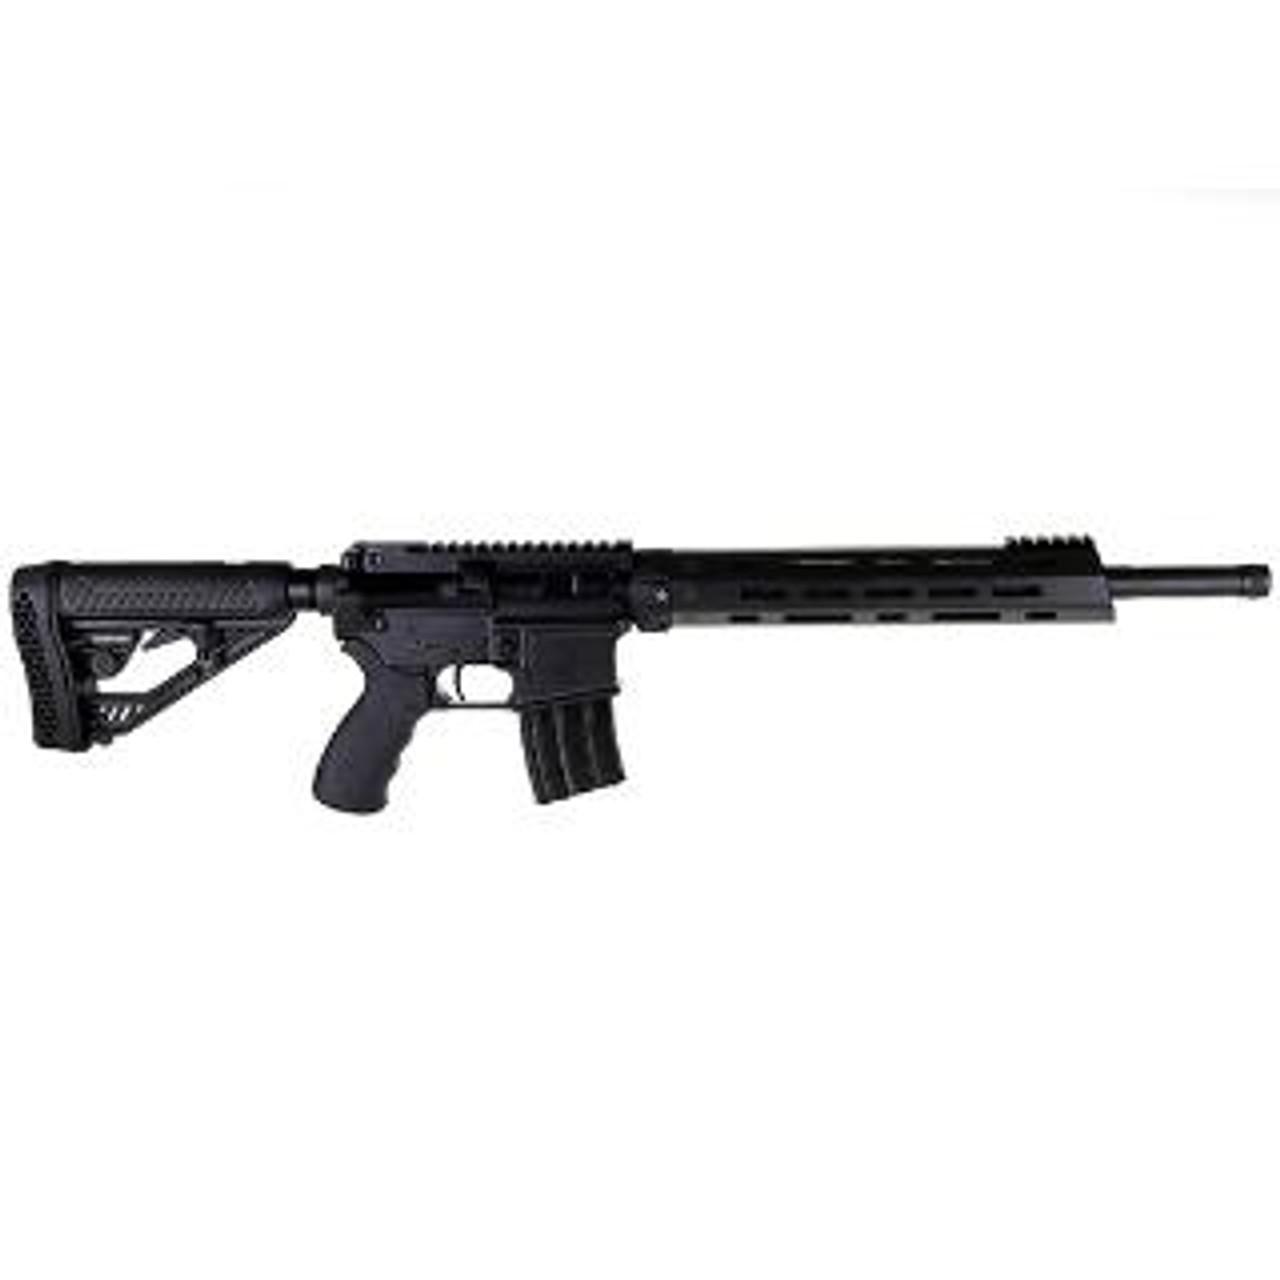 "Alexander Arms Hunter 16"" CALIFORNIA LEGAL - .50 Beowulf®"